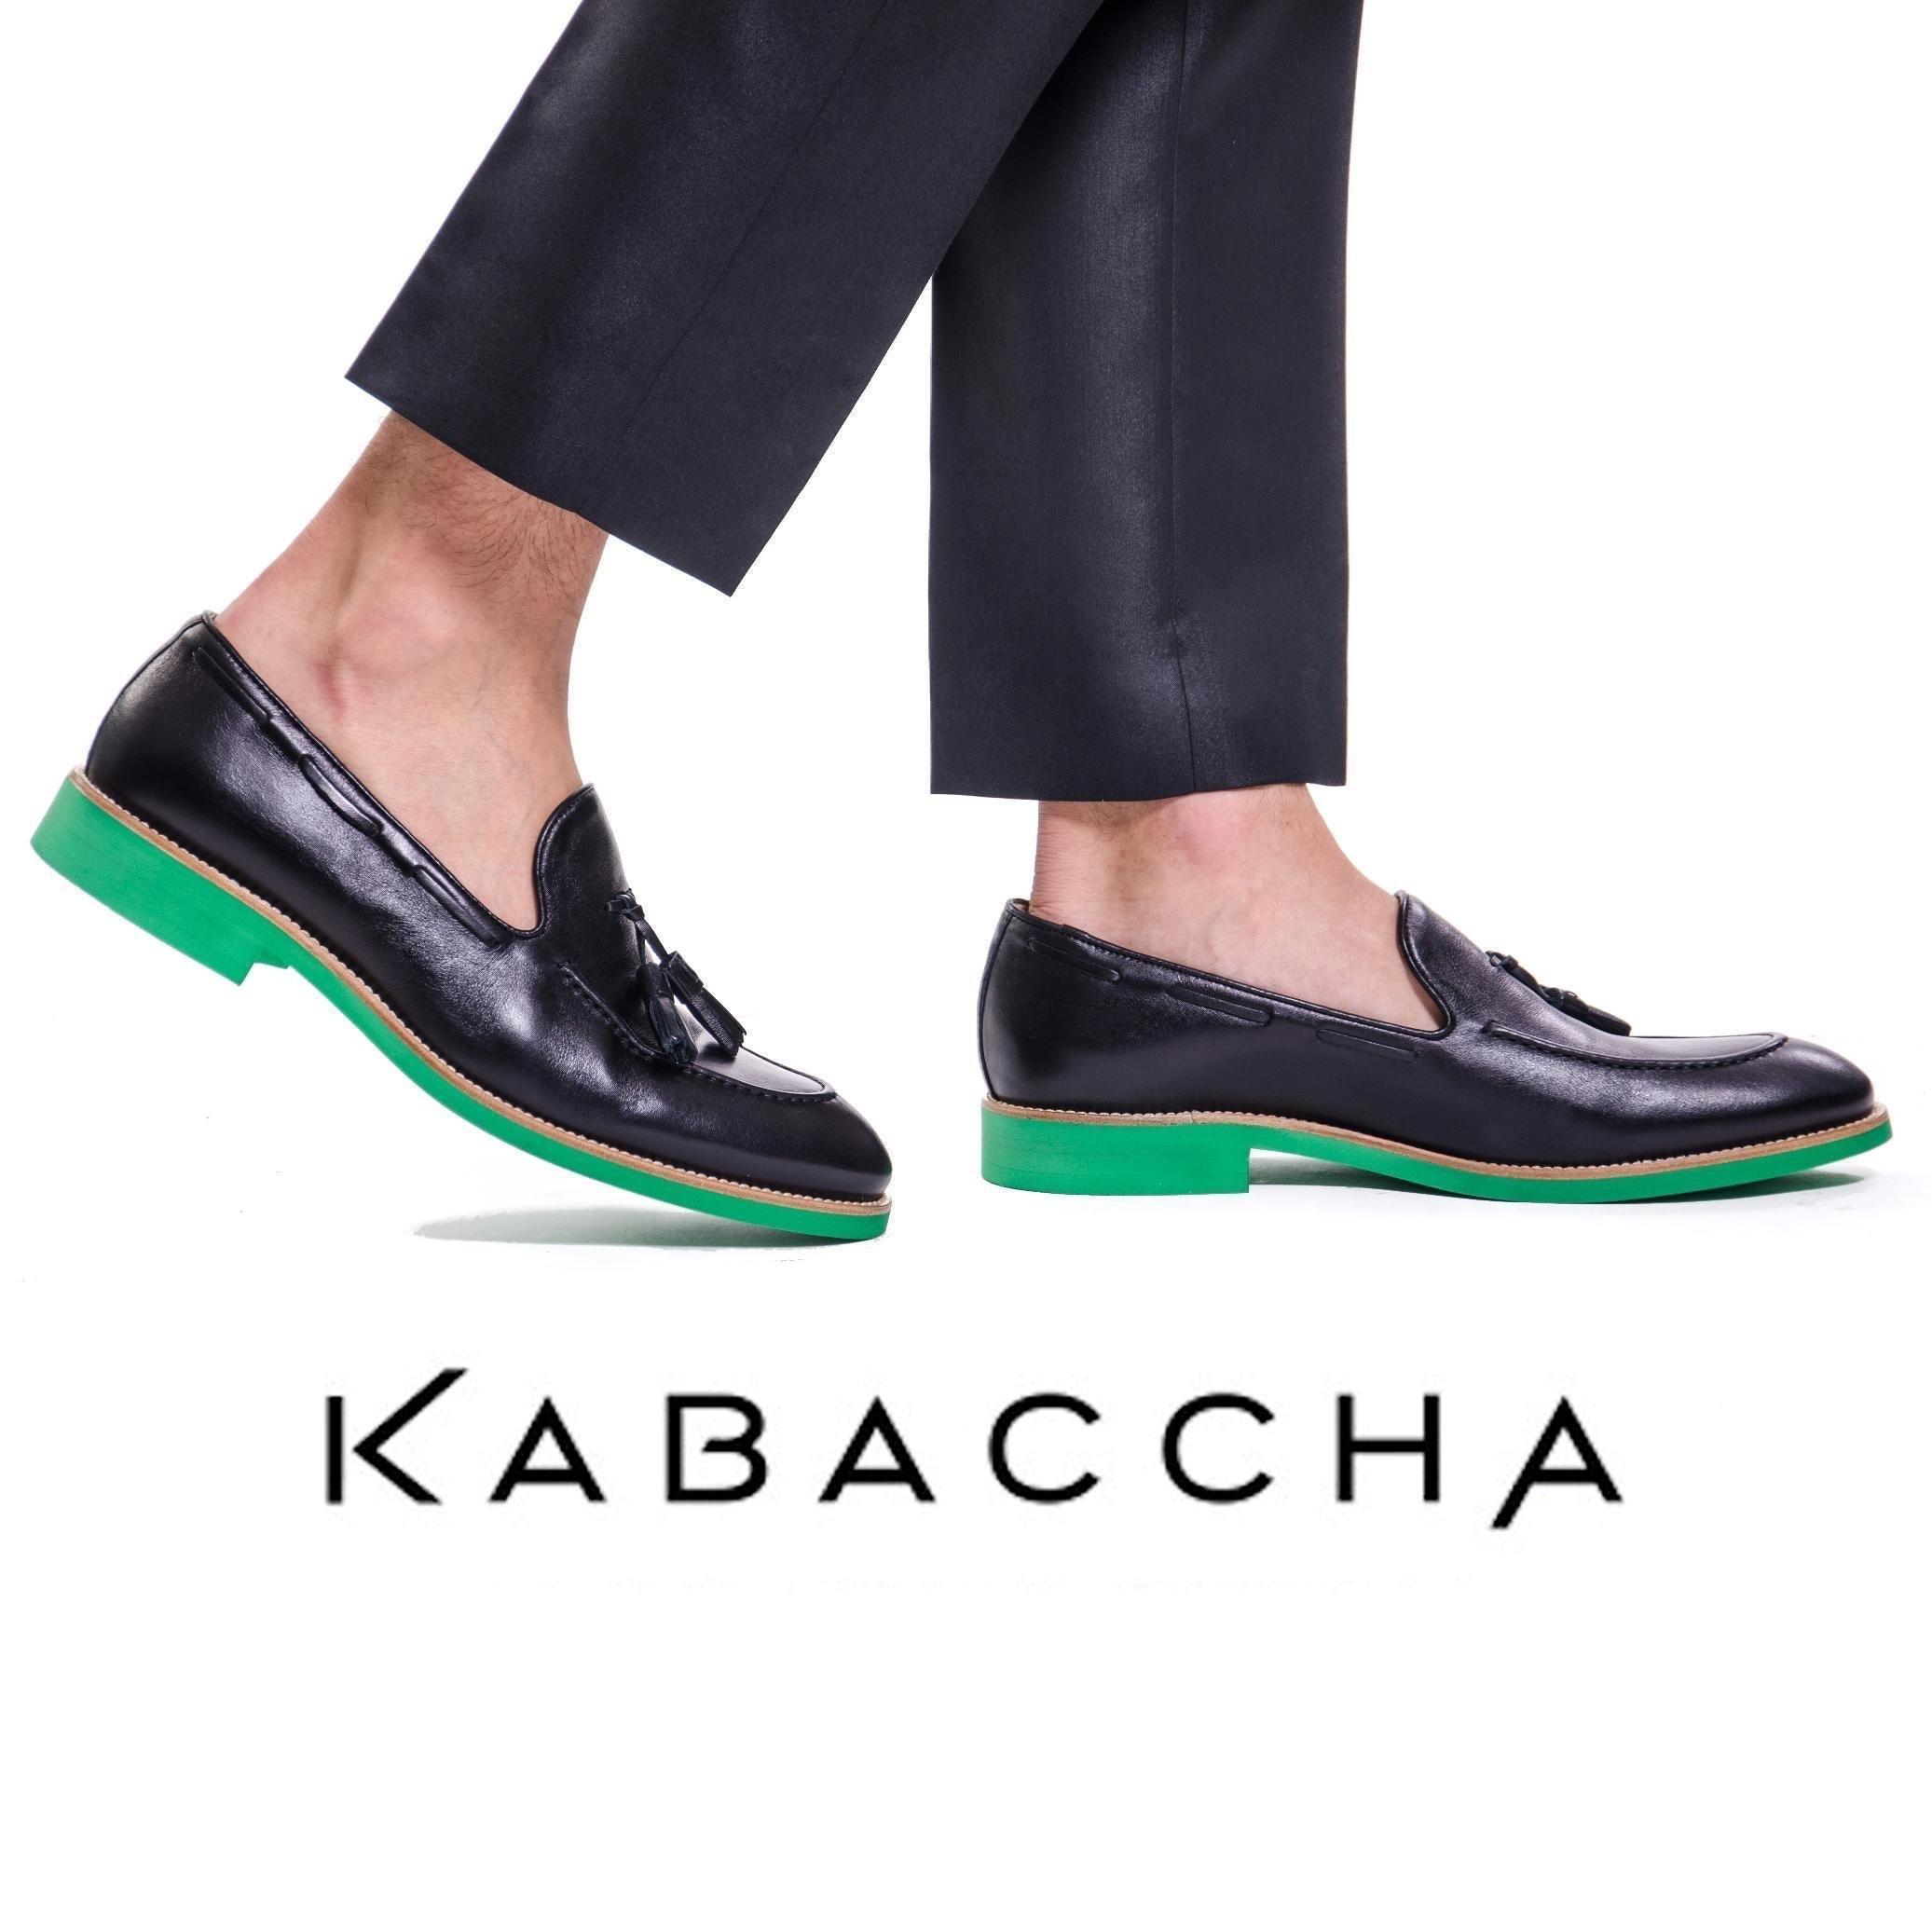 Kabaccha Shoes